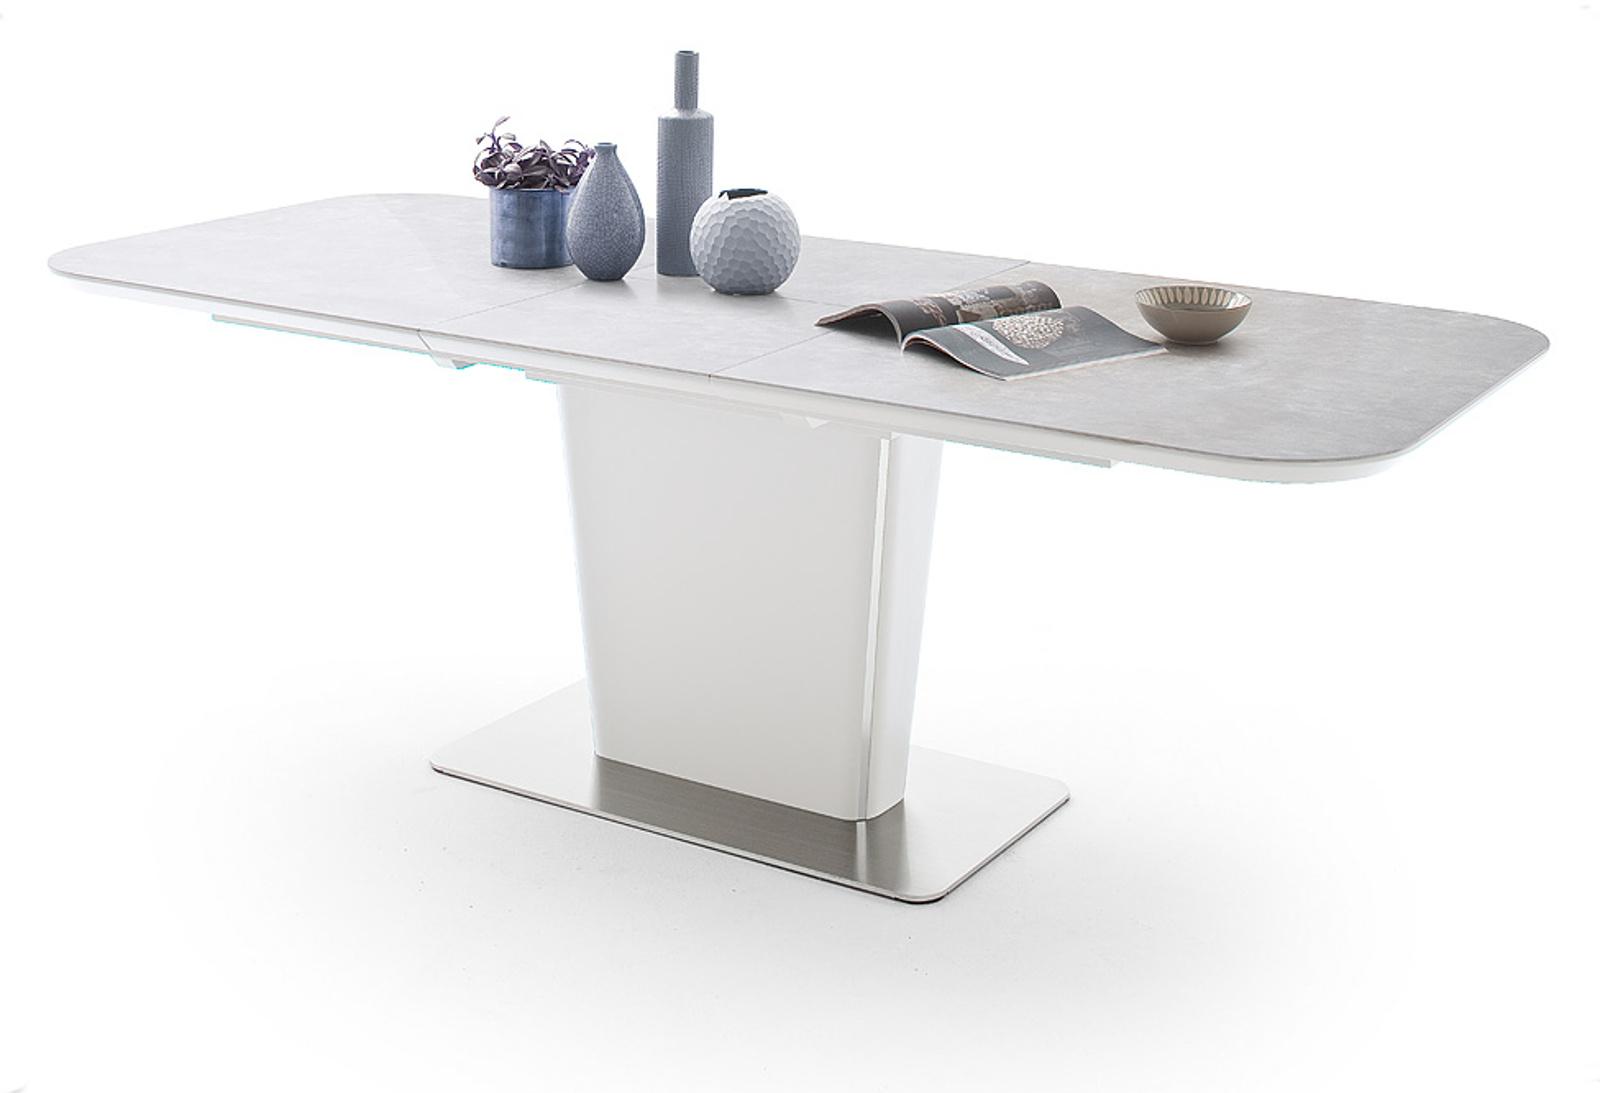 esstisch koami wei lack keramik grau 140 cm. Black Bedroom Furniture Sets. Home Design Ideas